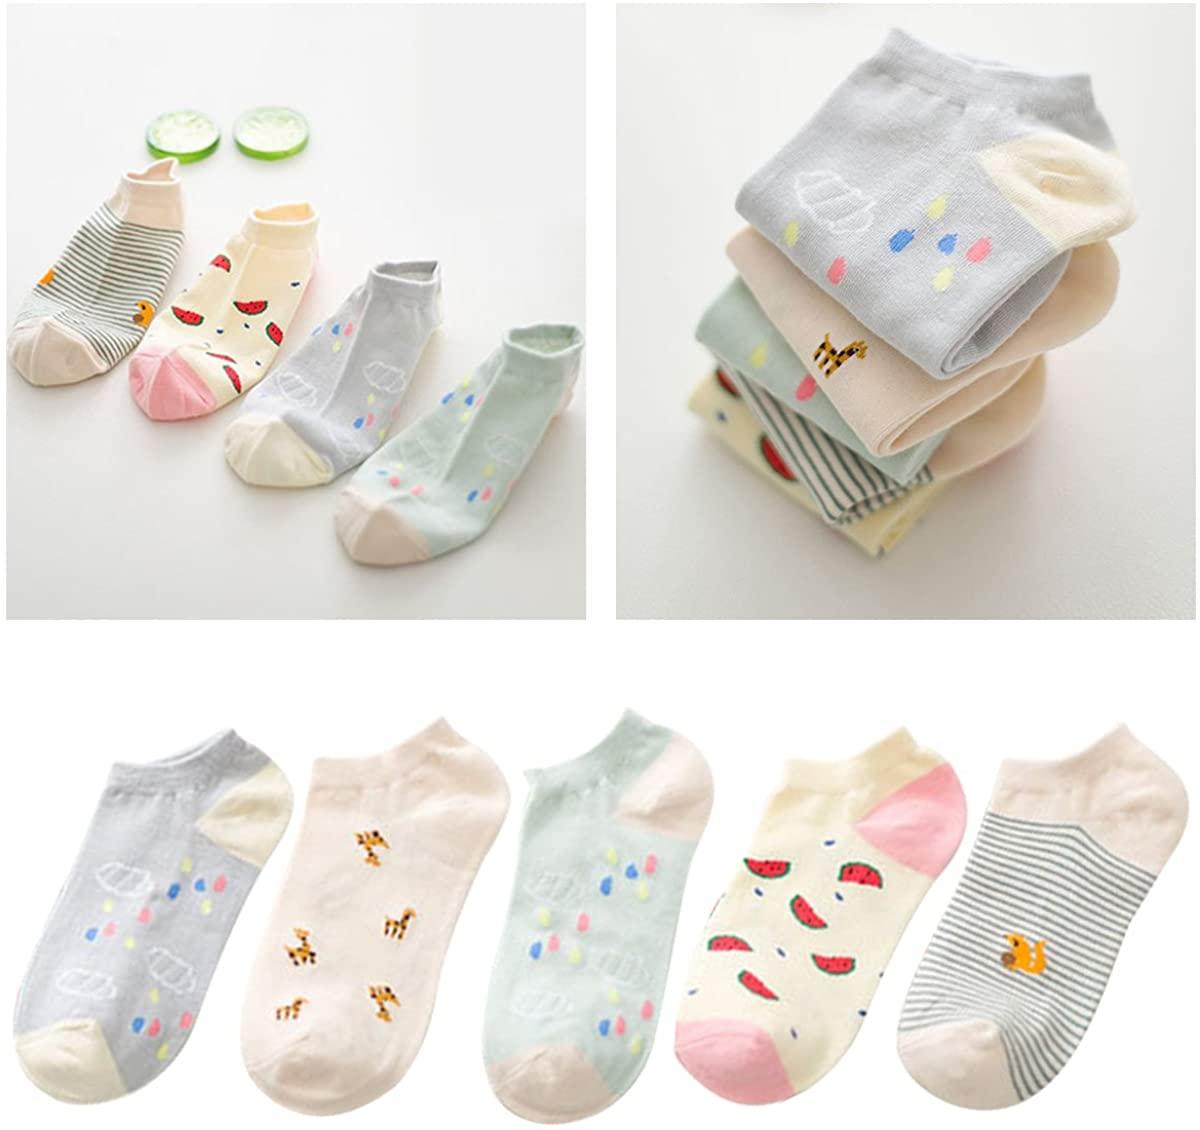 Glamorstar Women Socks Cotton No Show Low Cut Socks Ankle Sock 5 Pack